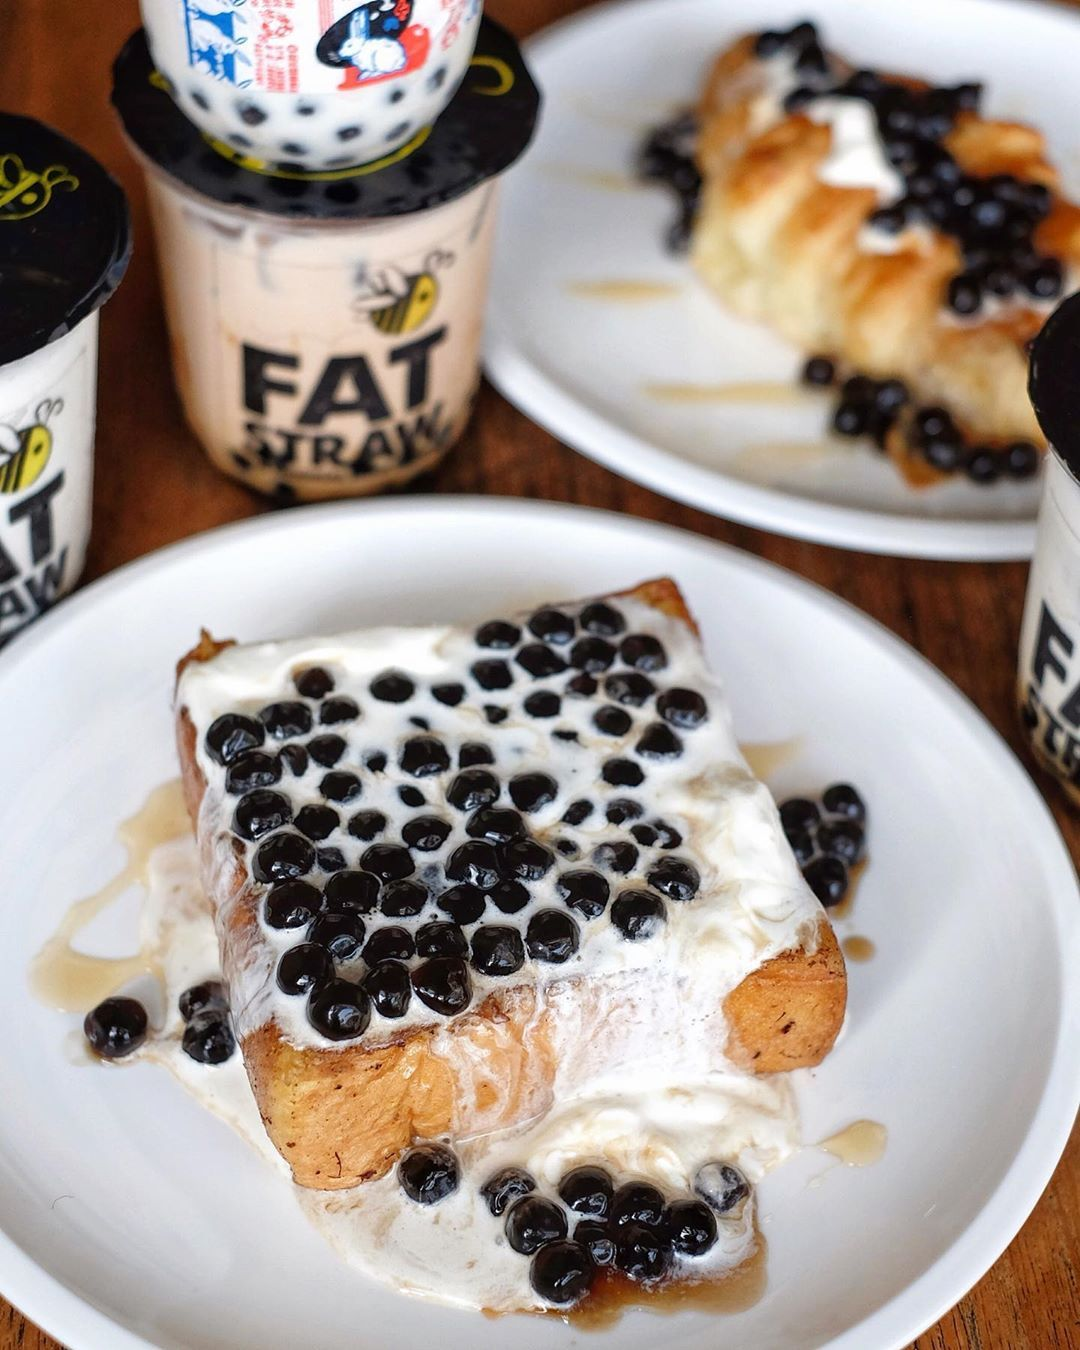 Berapa Hari Lalu Gue Nyobain Menu Barunya Dari Fatstraw Creamy Seasalt Boba Toast Roti Panggang Yang Empuk Dengan Cream Seasalt Makanan Roti Panggang Toast